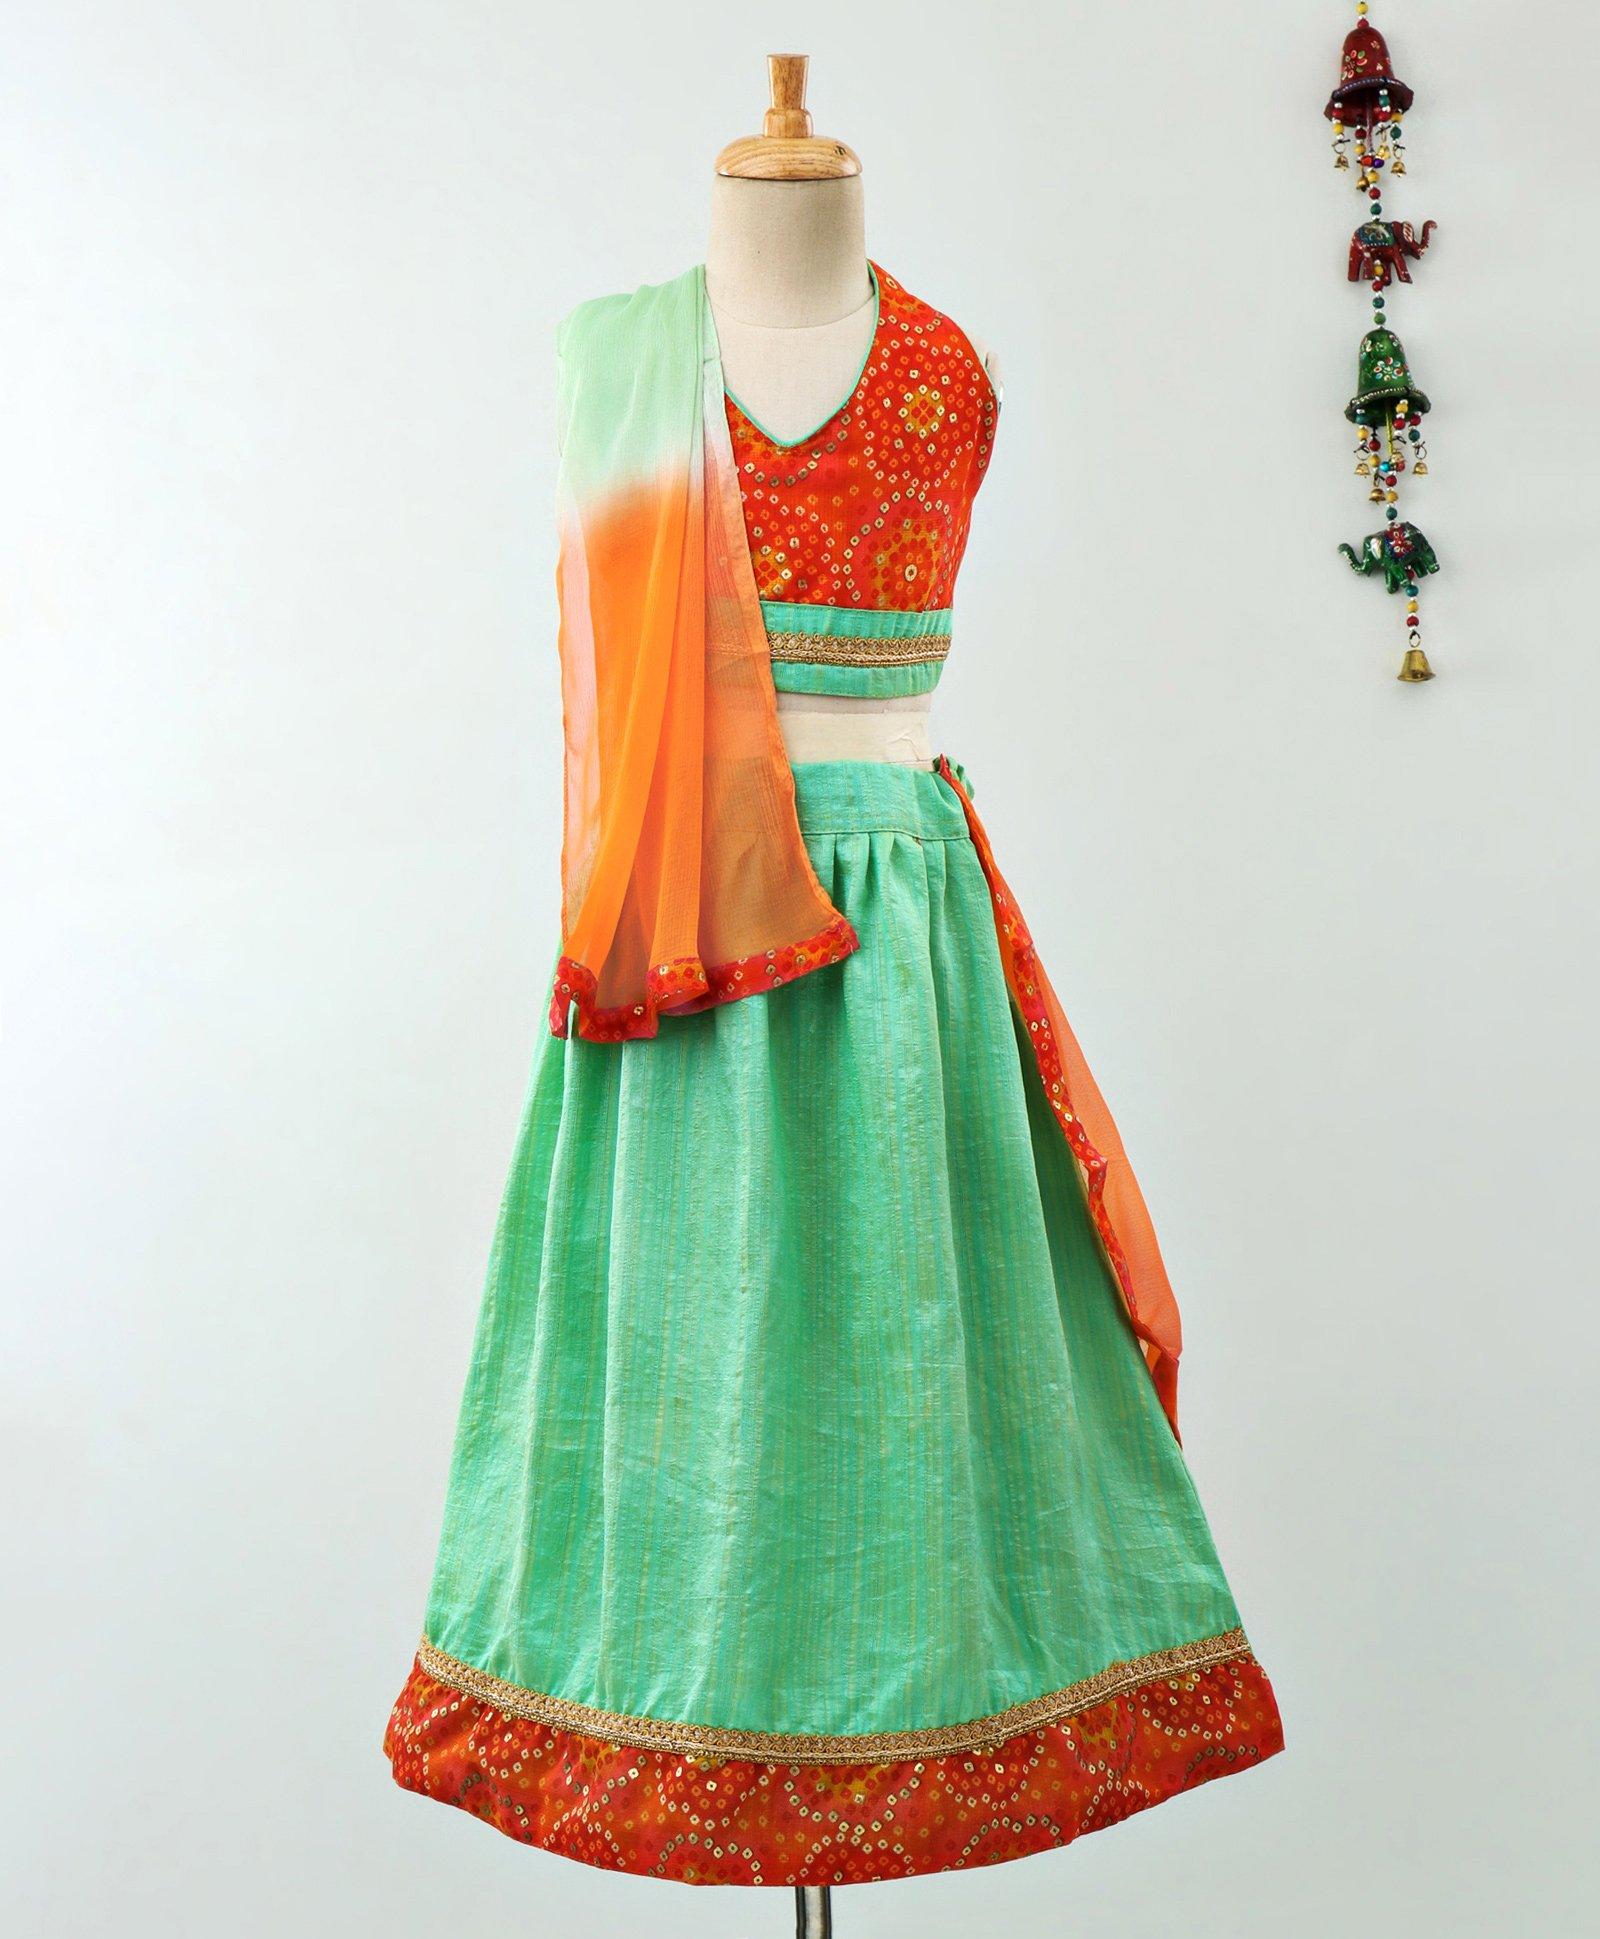 16d15314754c71 Bownbee Bandhani Print Lehenga & Sleeveless Choli - Green & Red